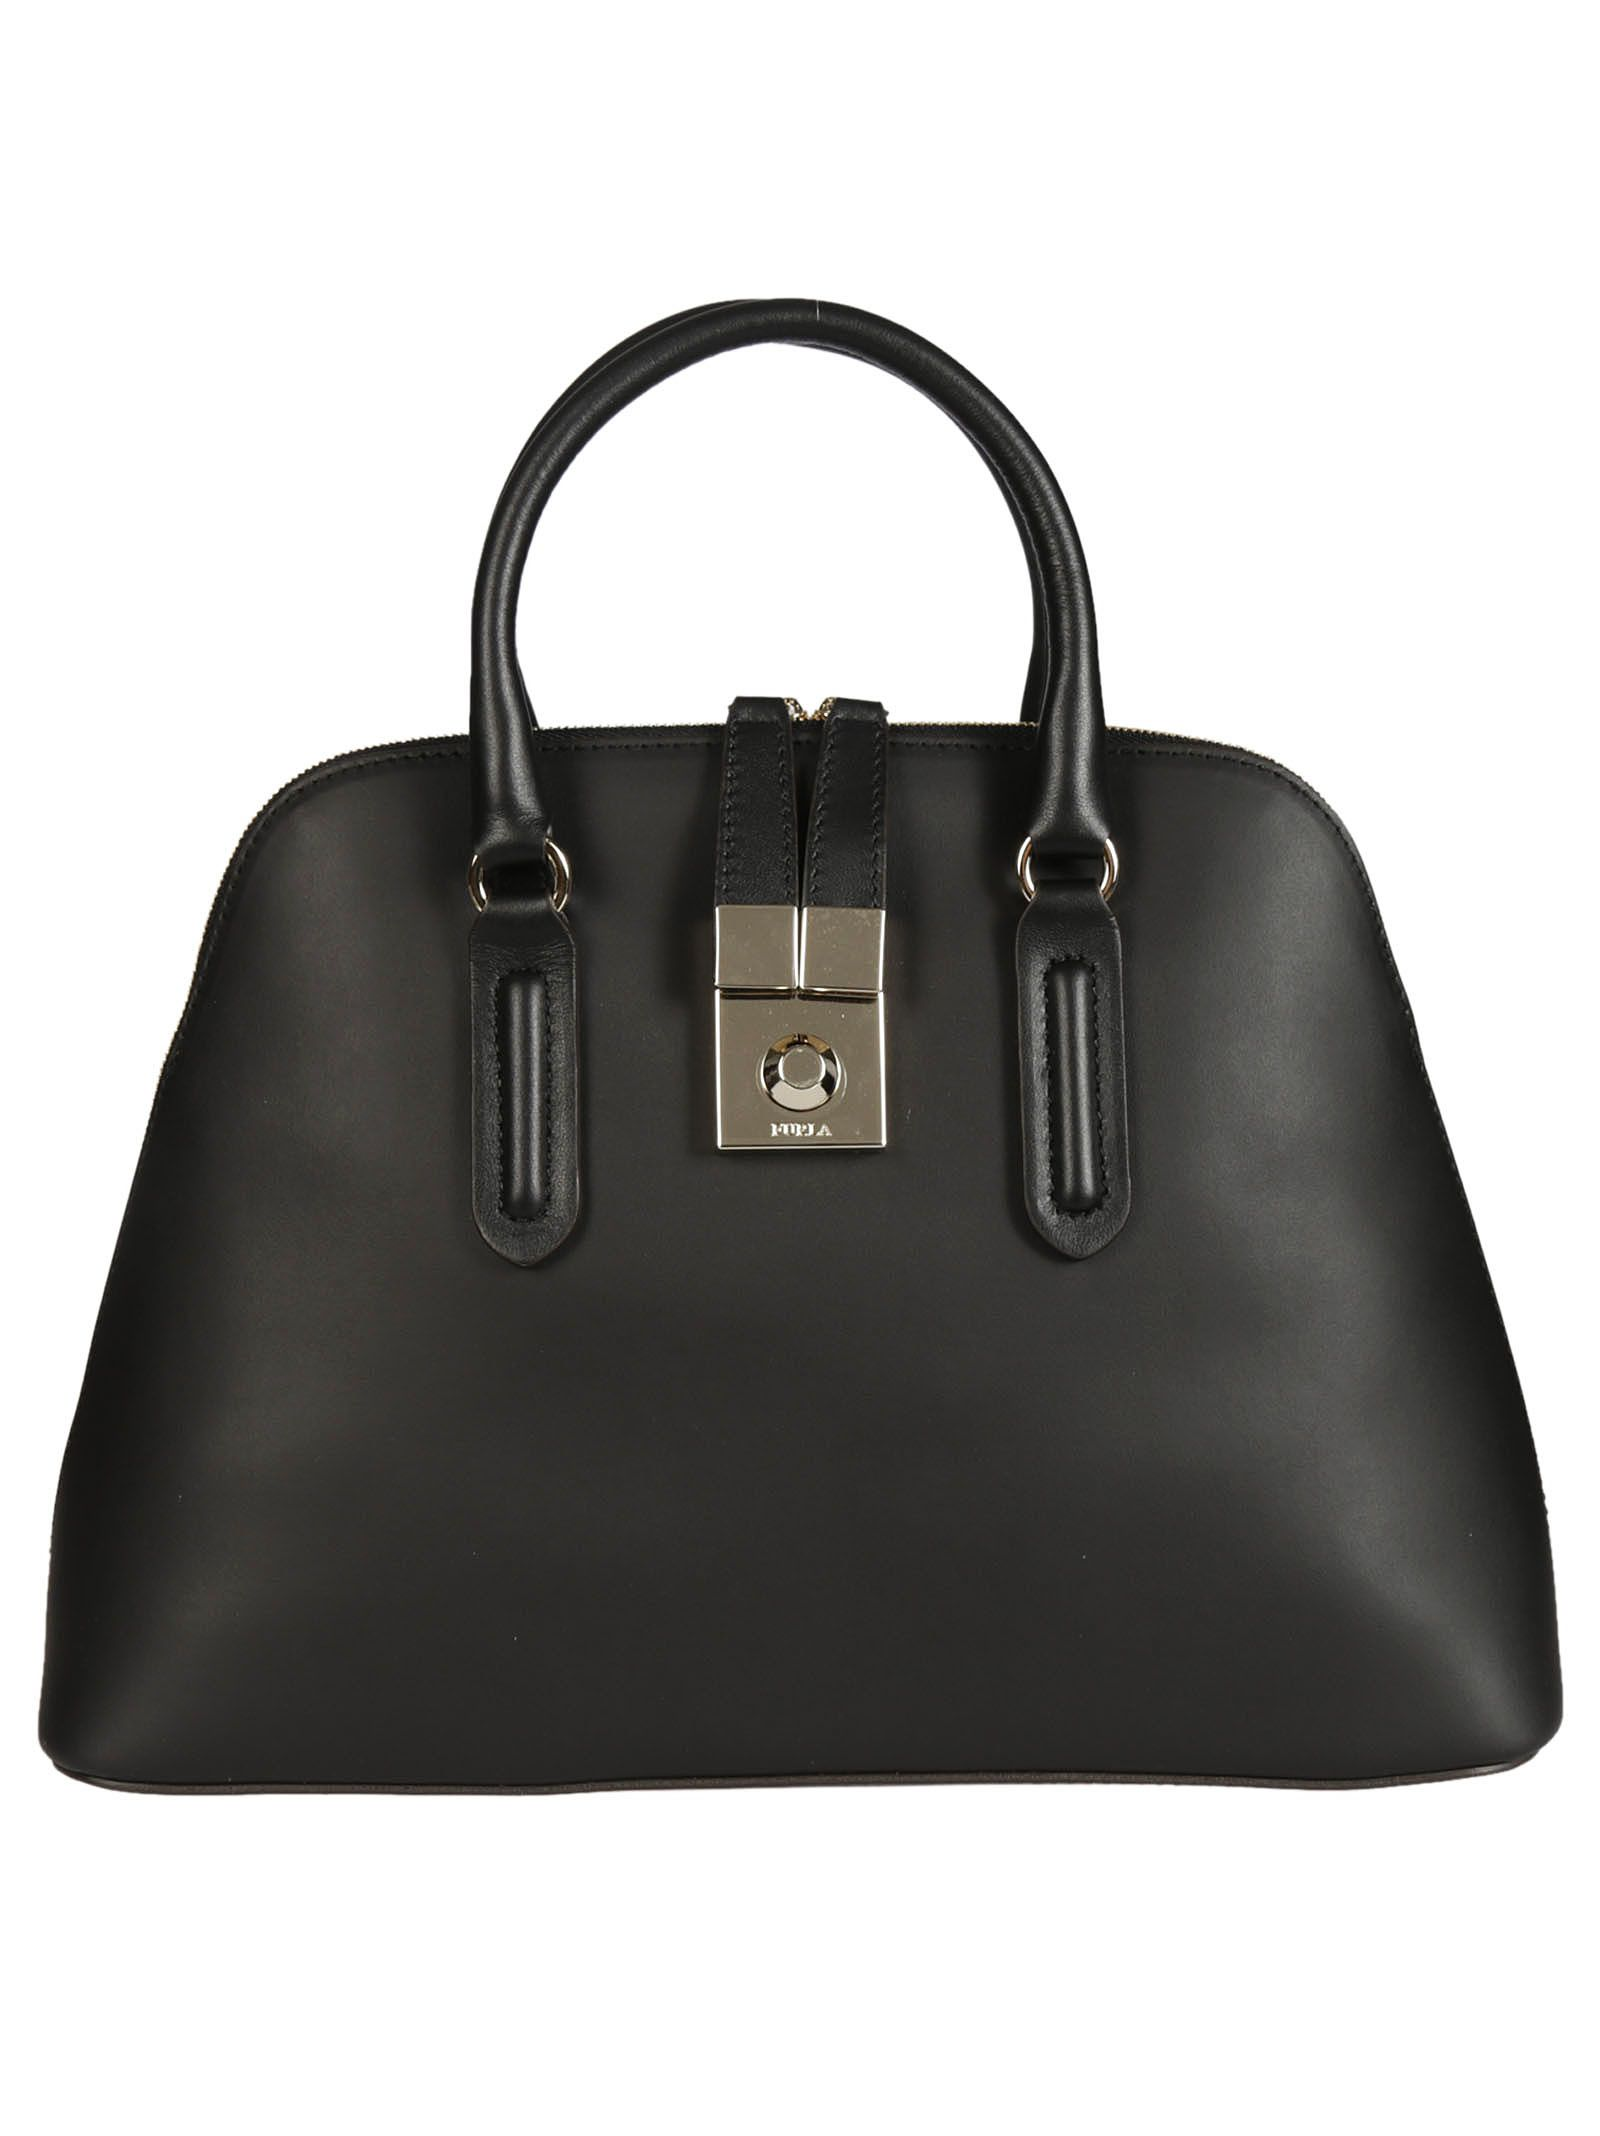 Furla - Furla Milano Shoulder Bag